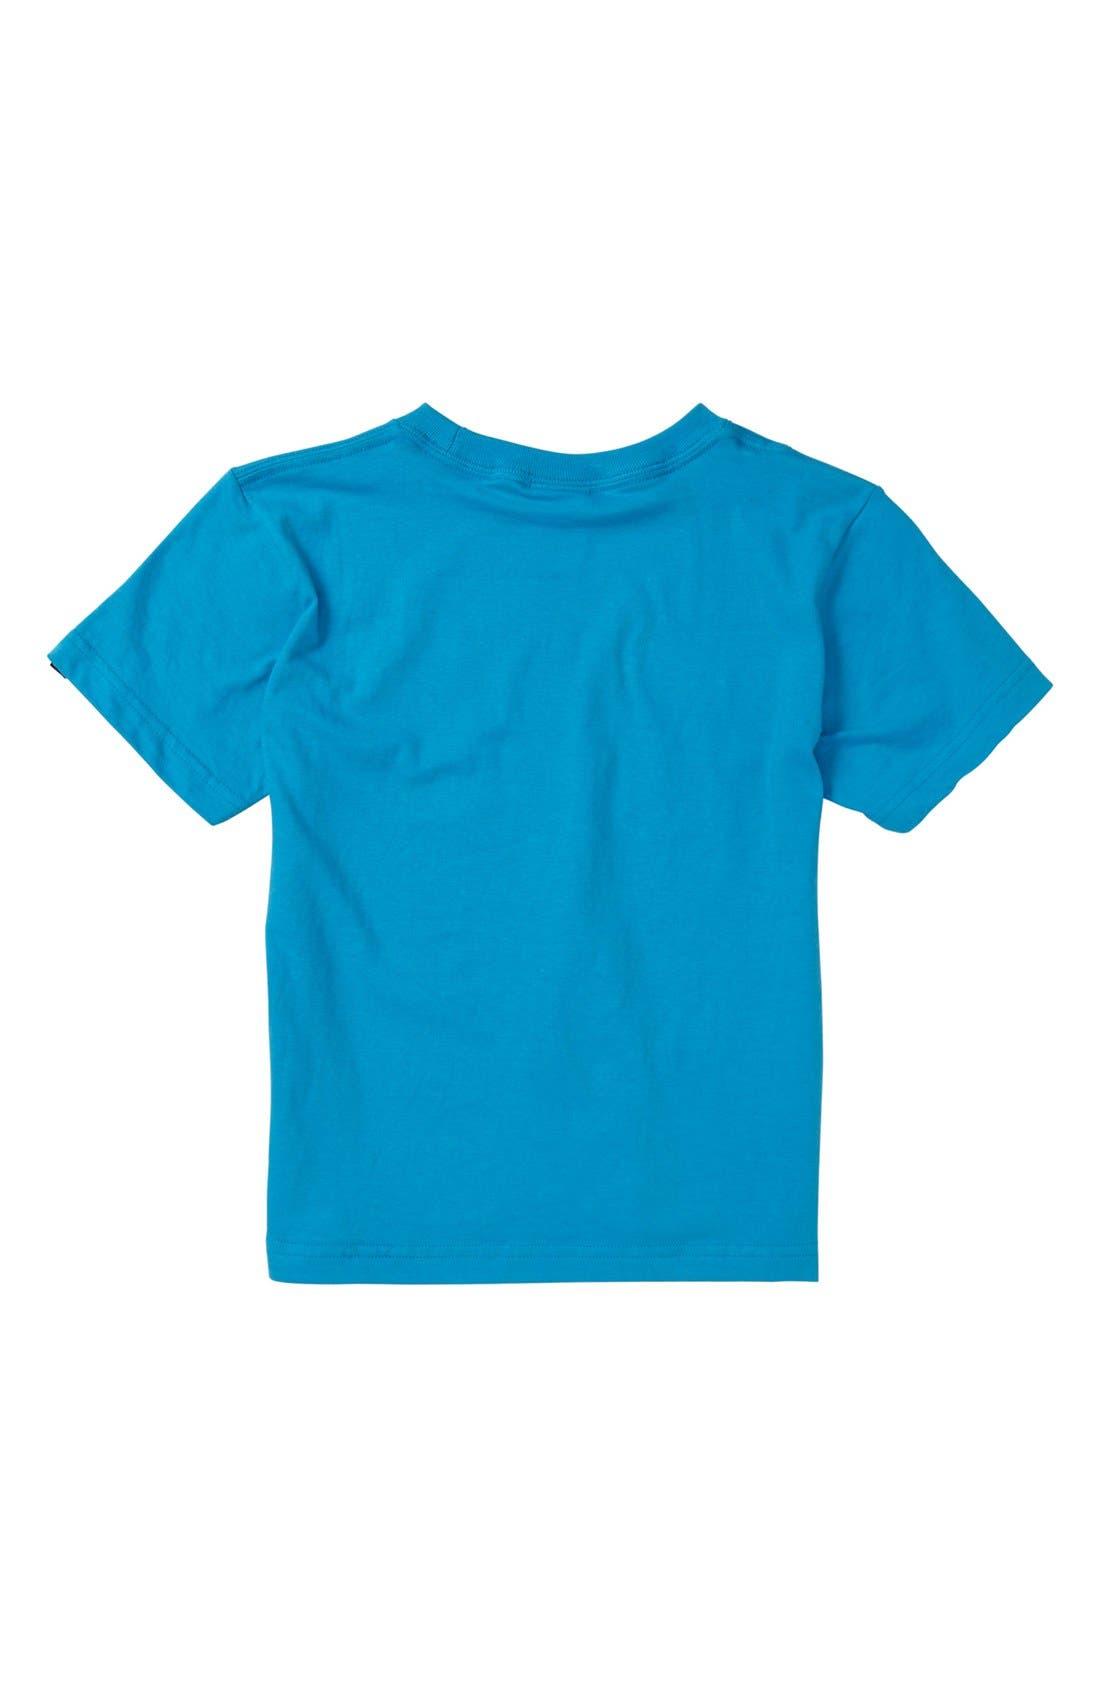 Alternate Image 2  - Quiksilver 'Free Ride' T-Shirt (Baby Boys)